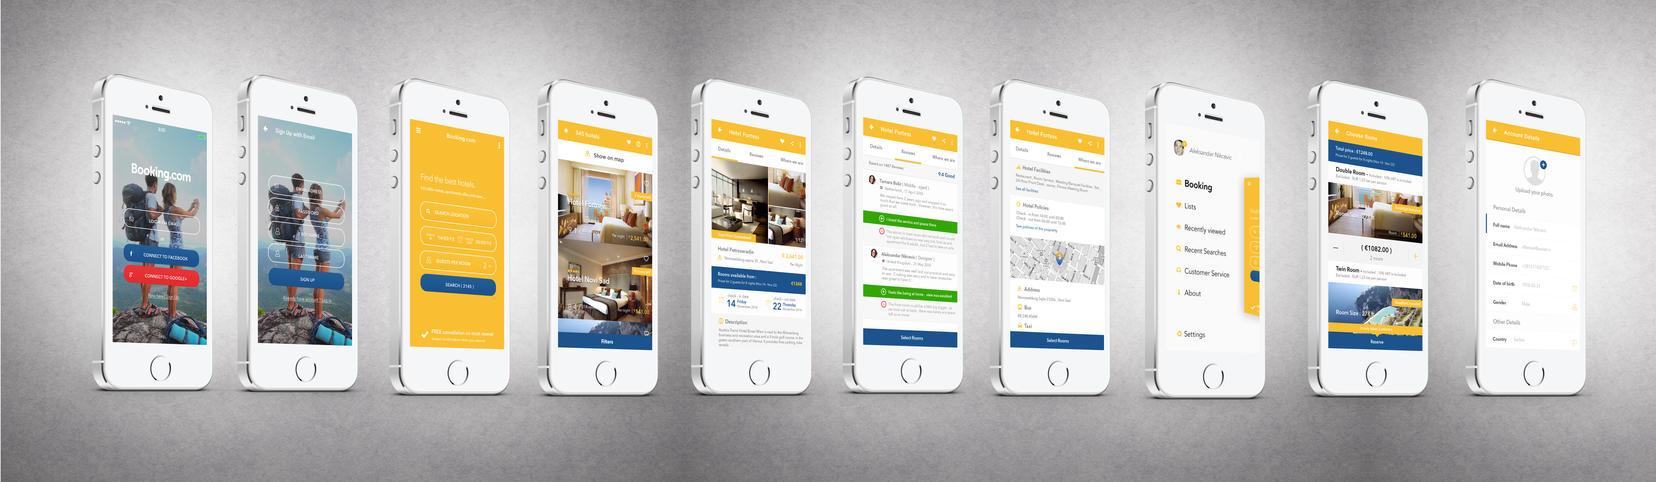 Booking.com Concept App Design by vasiligfx